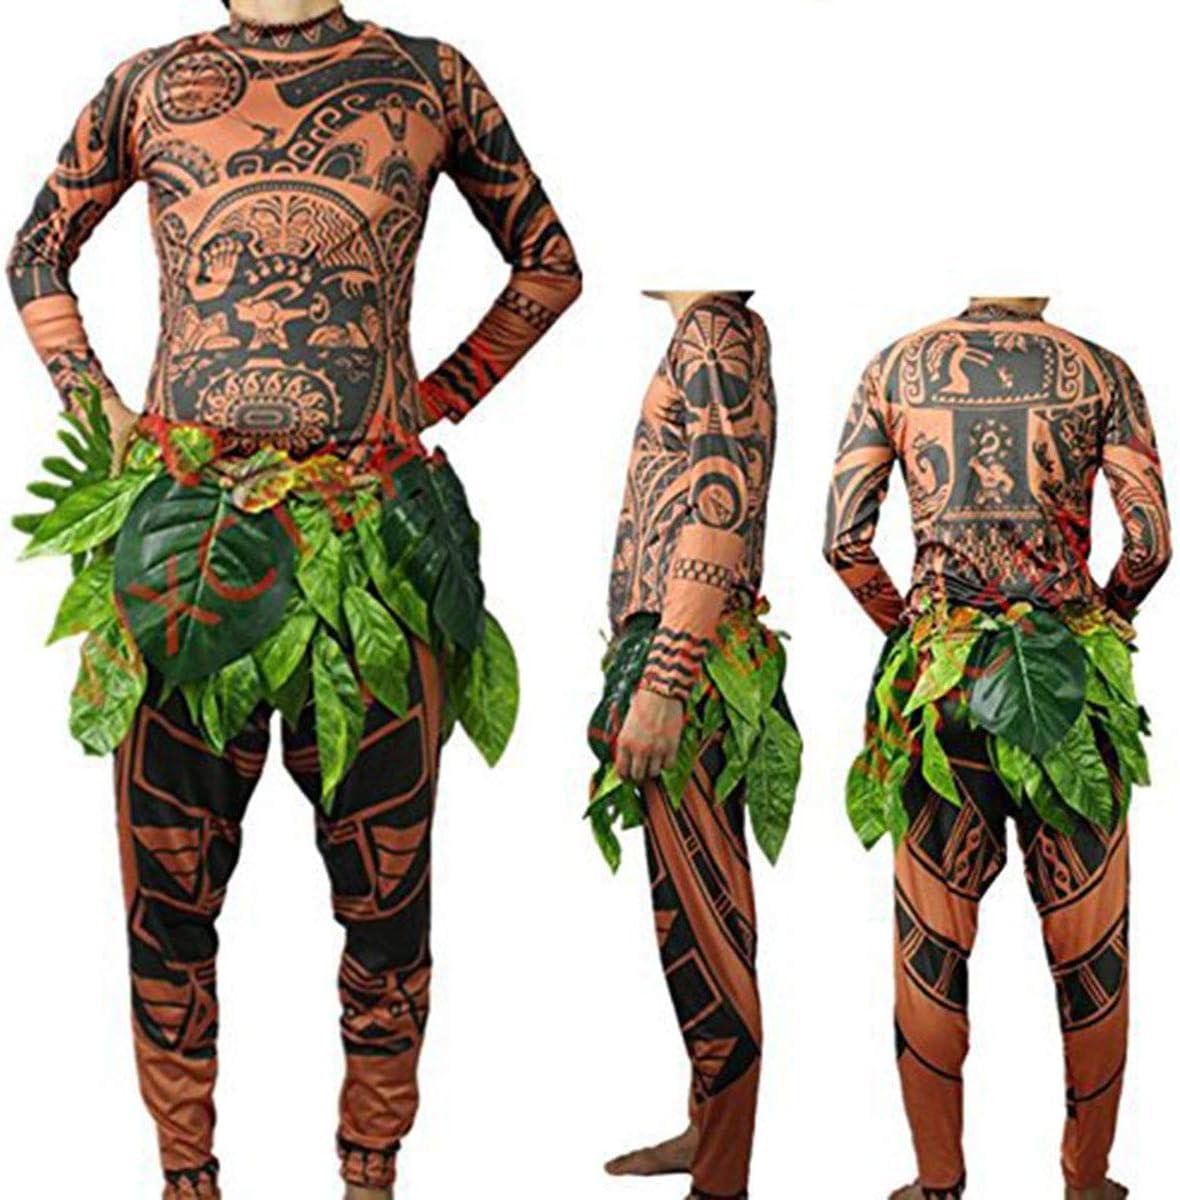 Kokosnuss Bh Orange Leis Girlande Hawaii Kostüm Multifarben Bastrock